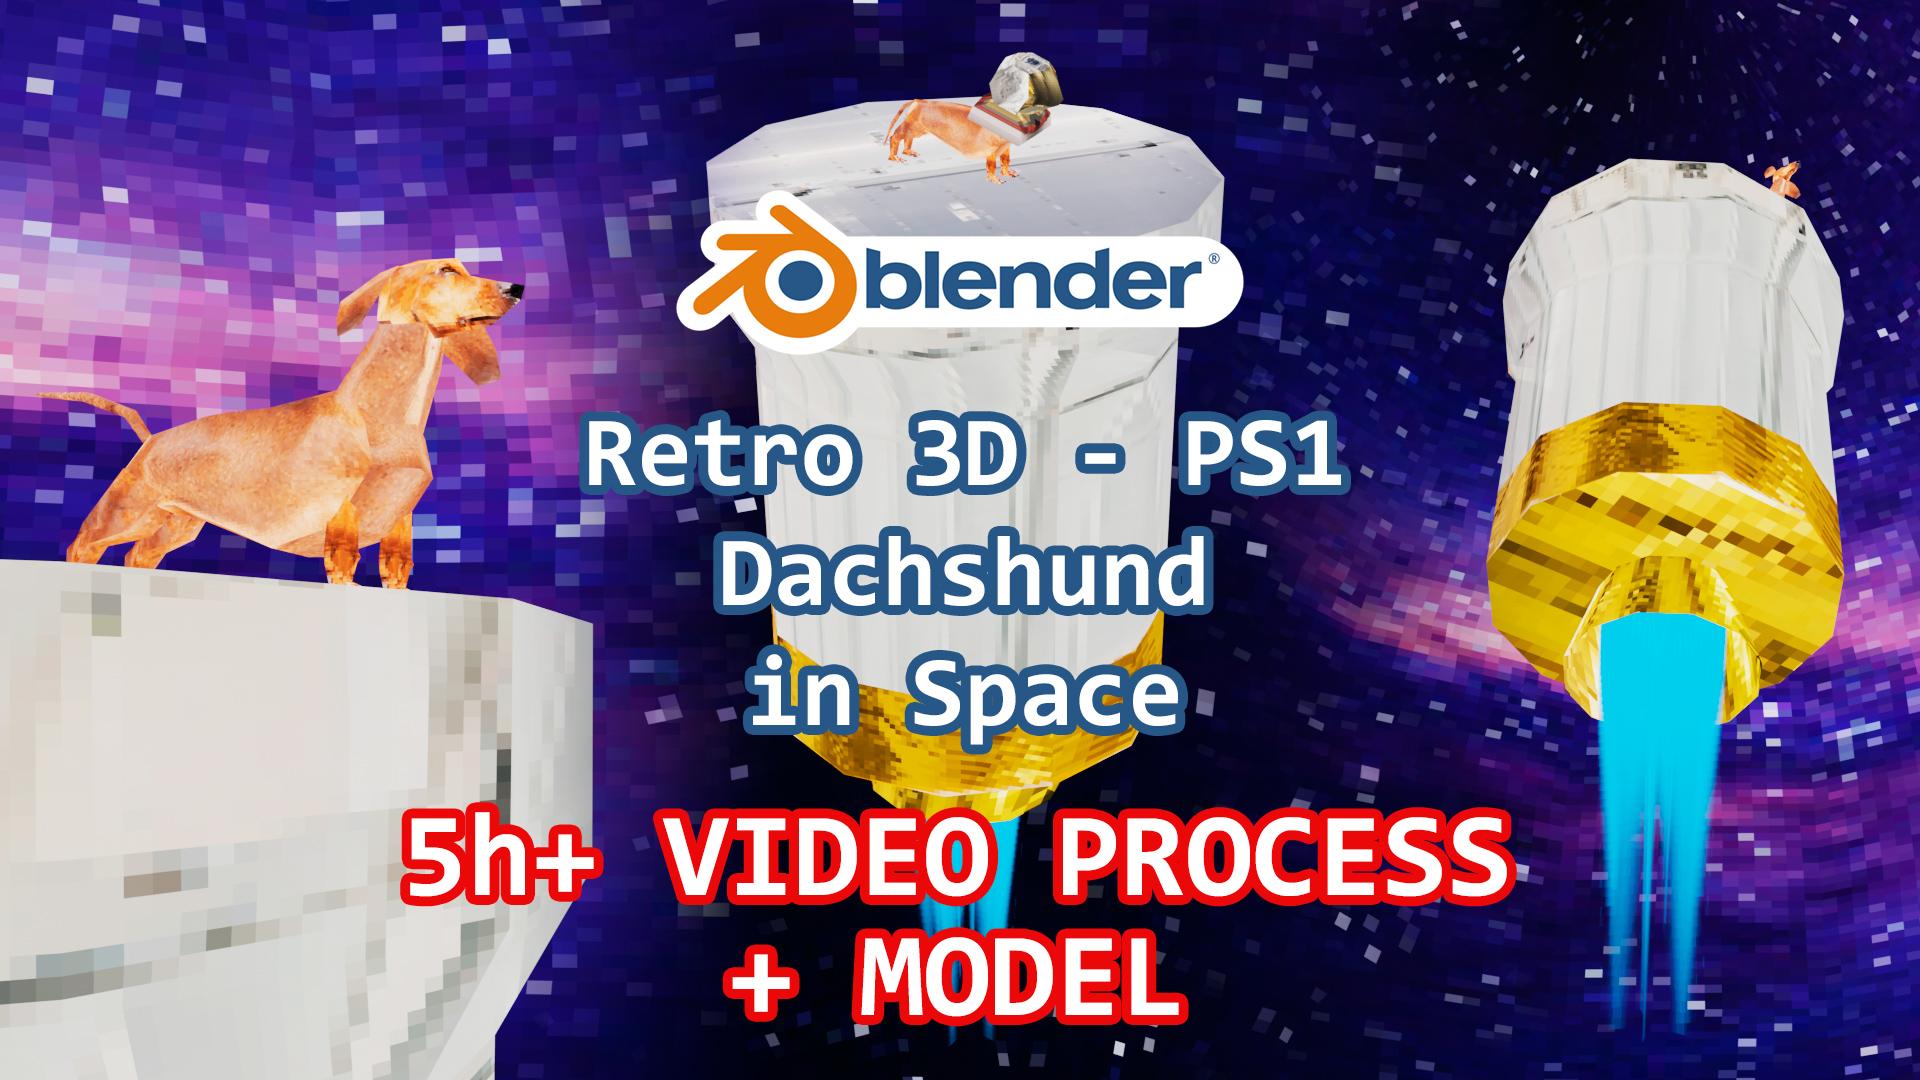 PS1 Dachshund Process Videos + Blender 3D Model